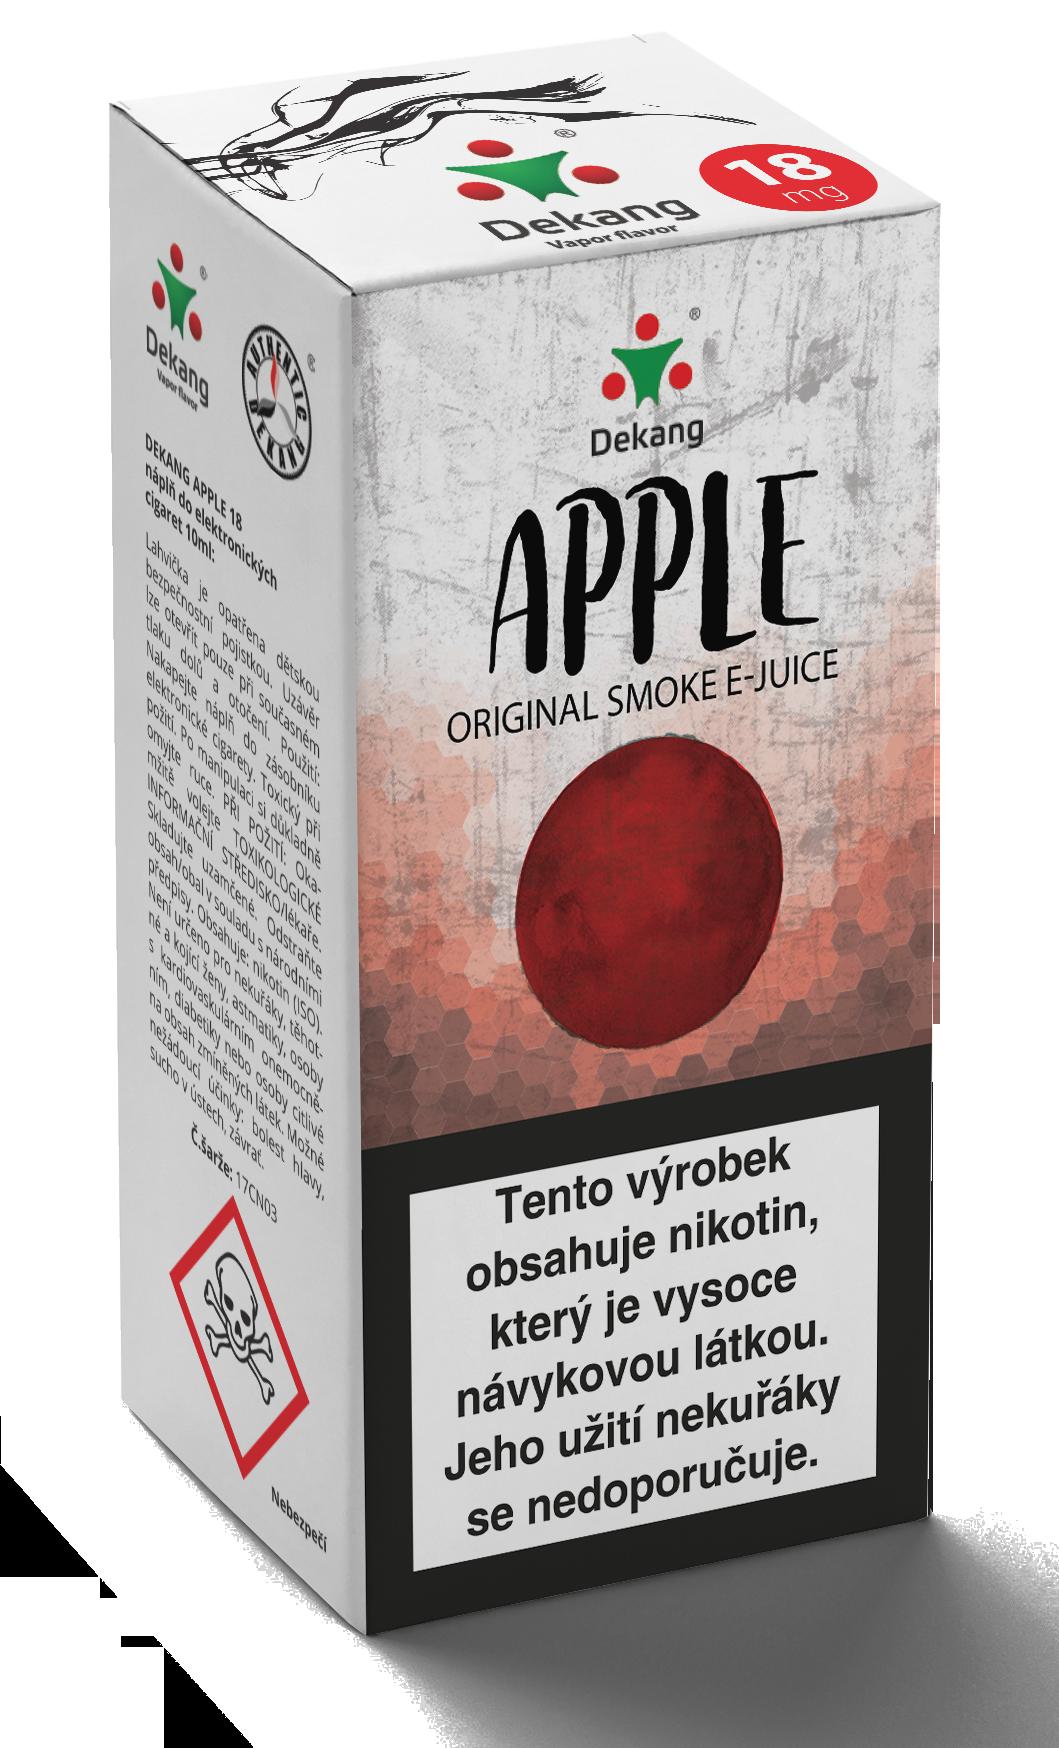 E-liquid Dekang 10ml Jablko - Apple Množství nikotinu: 0mg